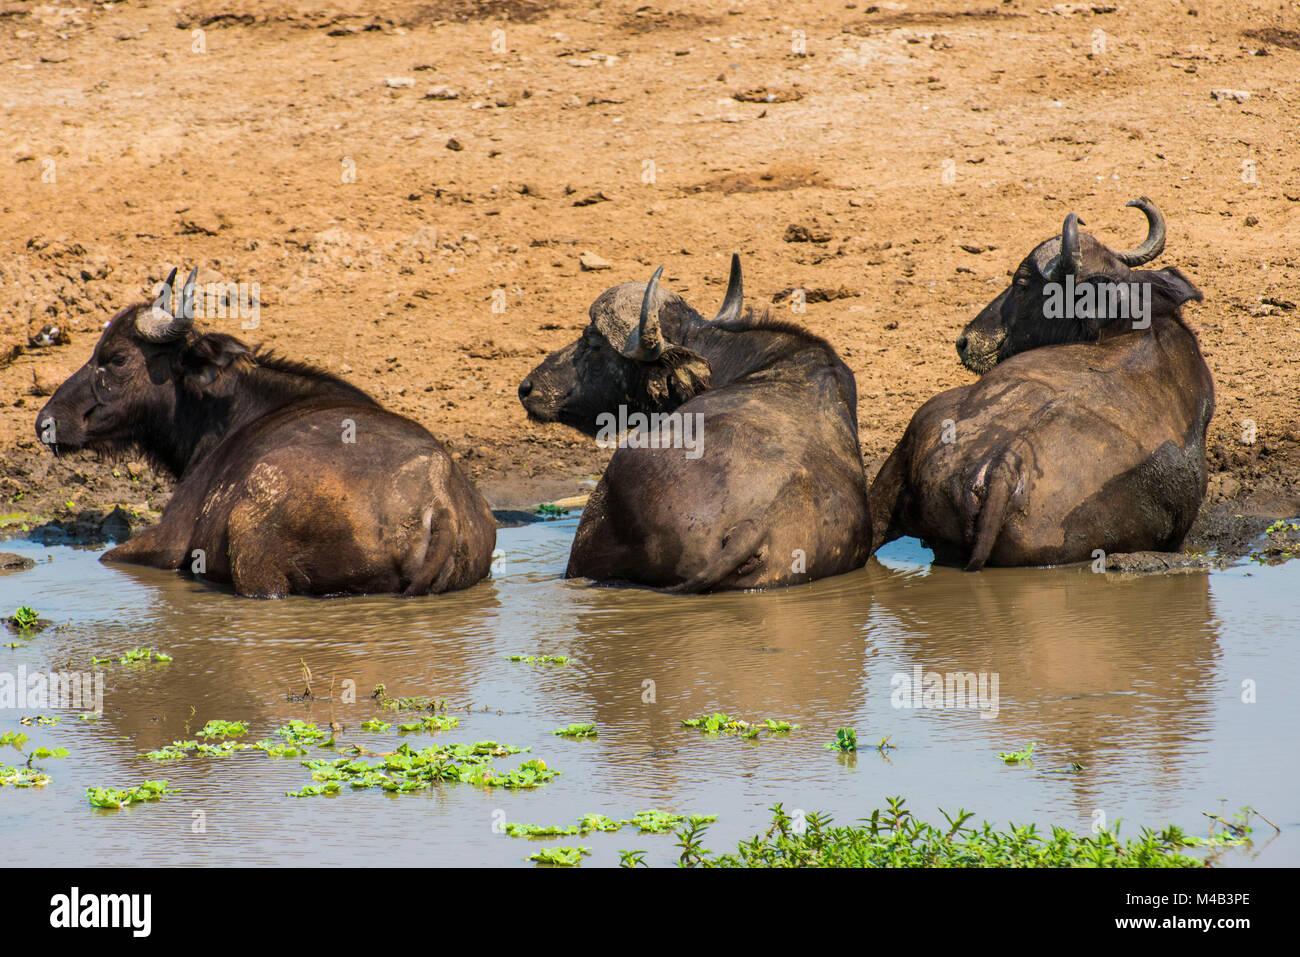 African buffalos or Cape buffalos (Syncerus caffer); Queen Elizabeth National Park,Uganda,Africa - Stock Image